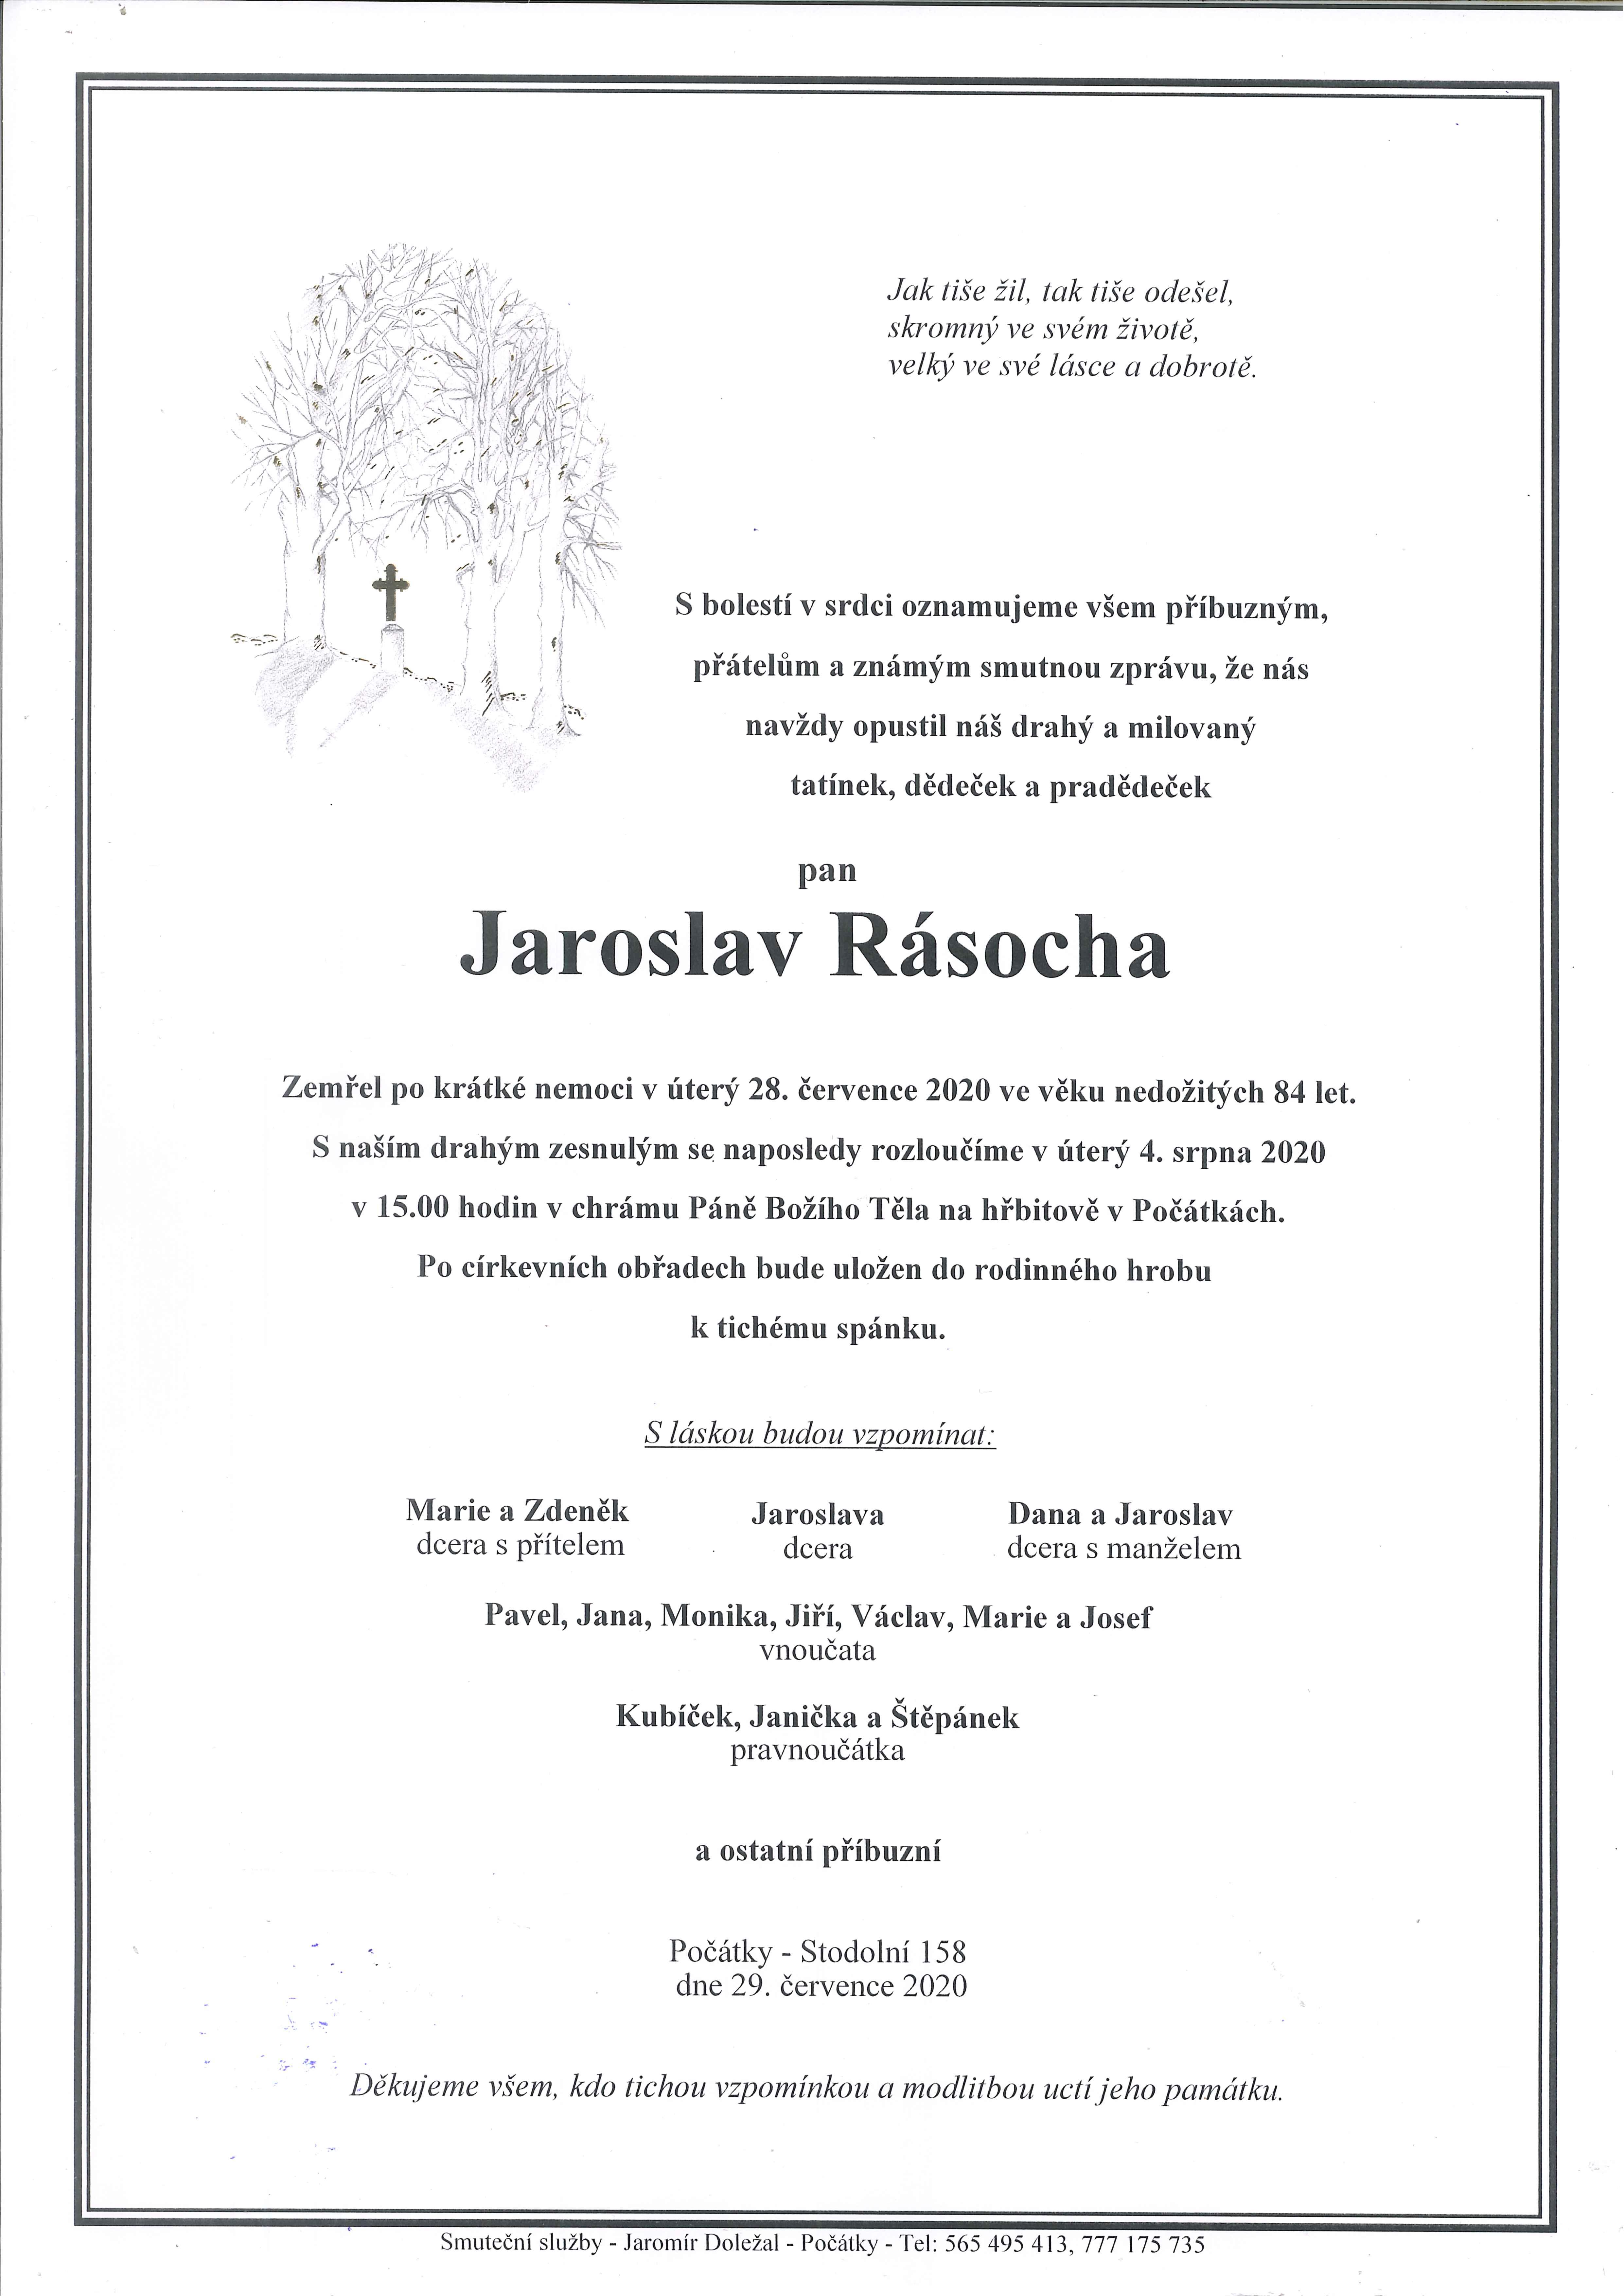 Jaroslav Rásocha